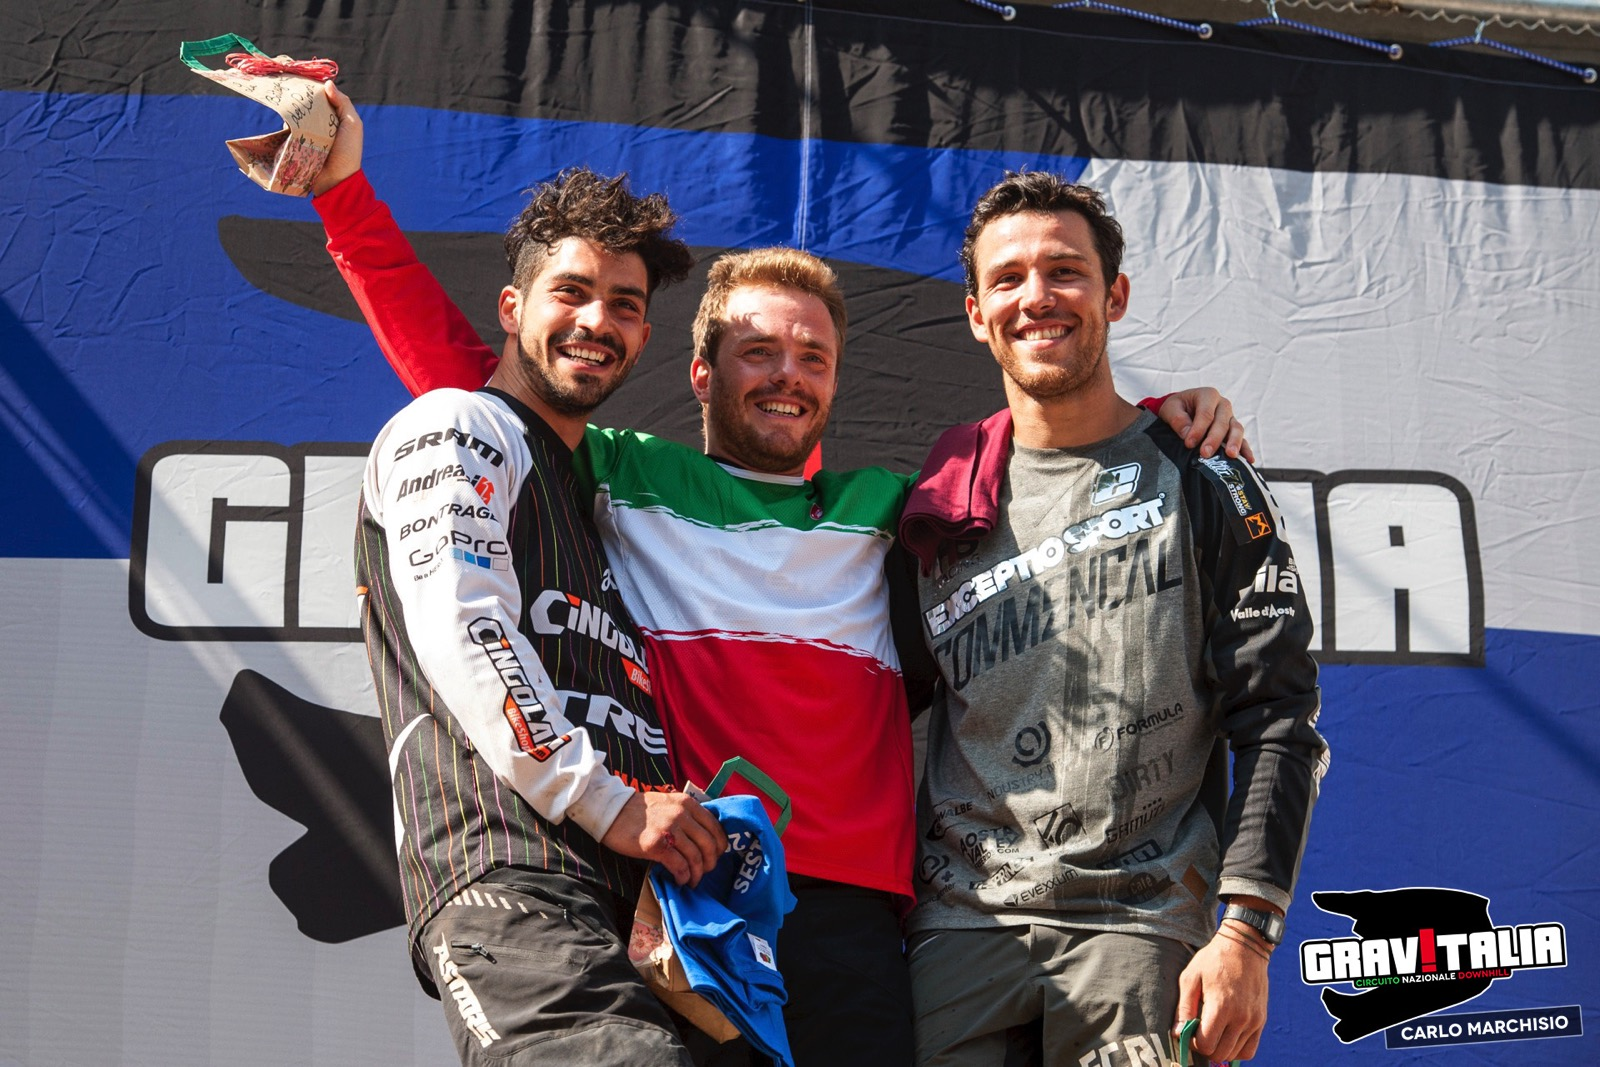 PhotoCarloMarchisio_GIT2015_CampionatiItaliani_Sestola_101